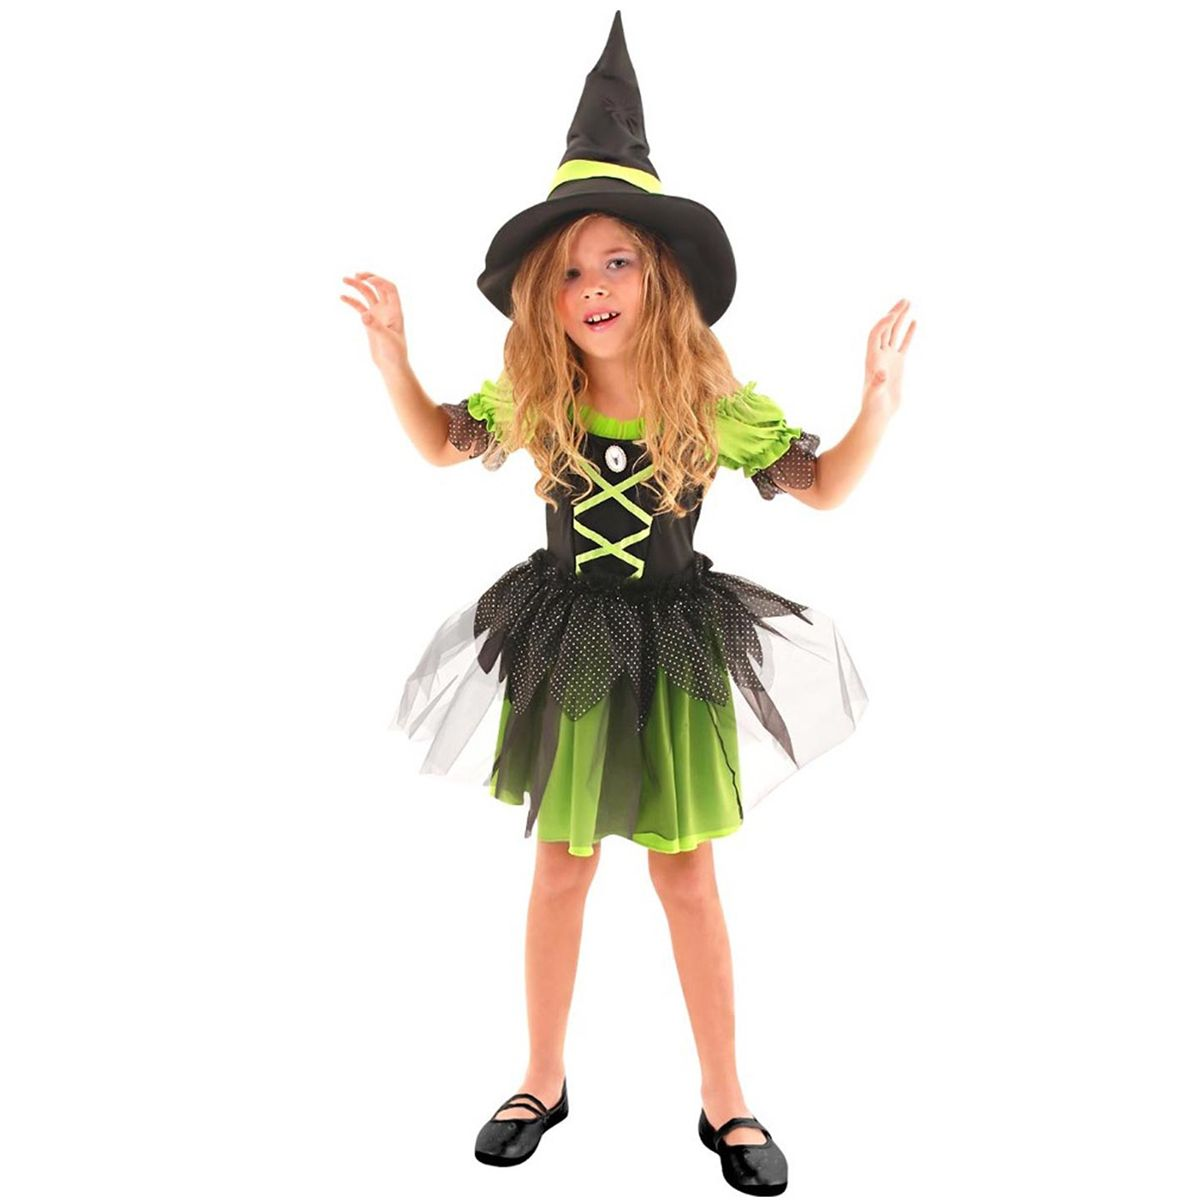 Fantasia Bruxa Divertida Infantil